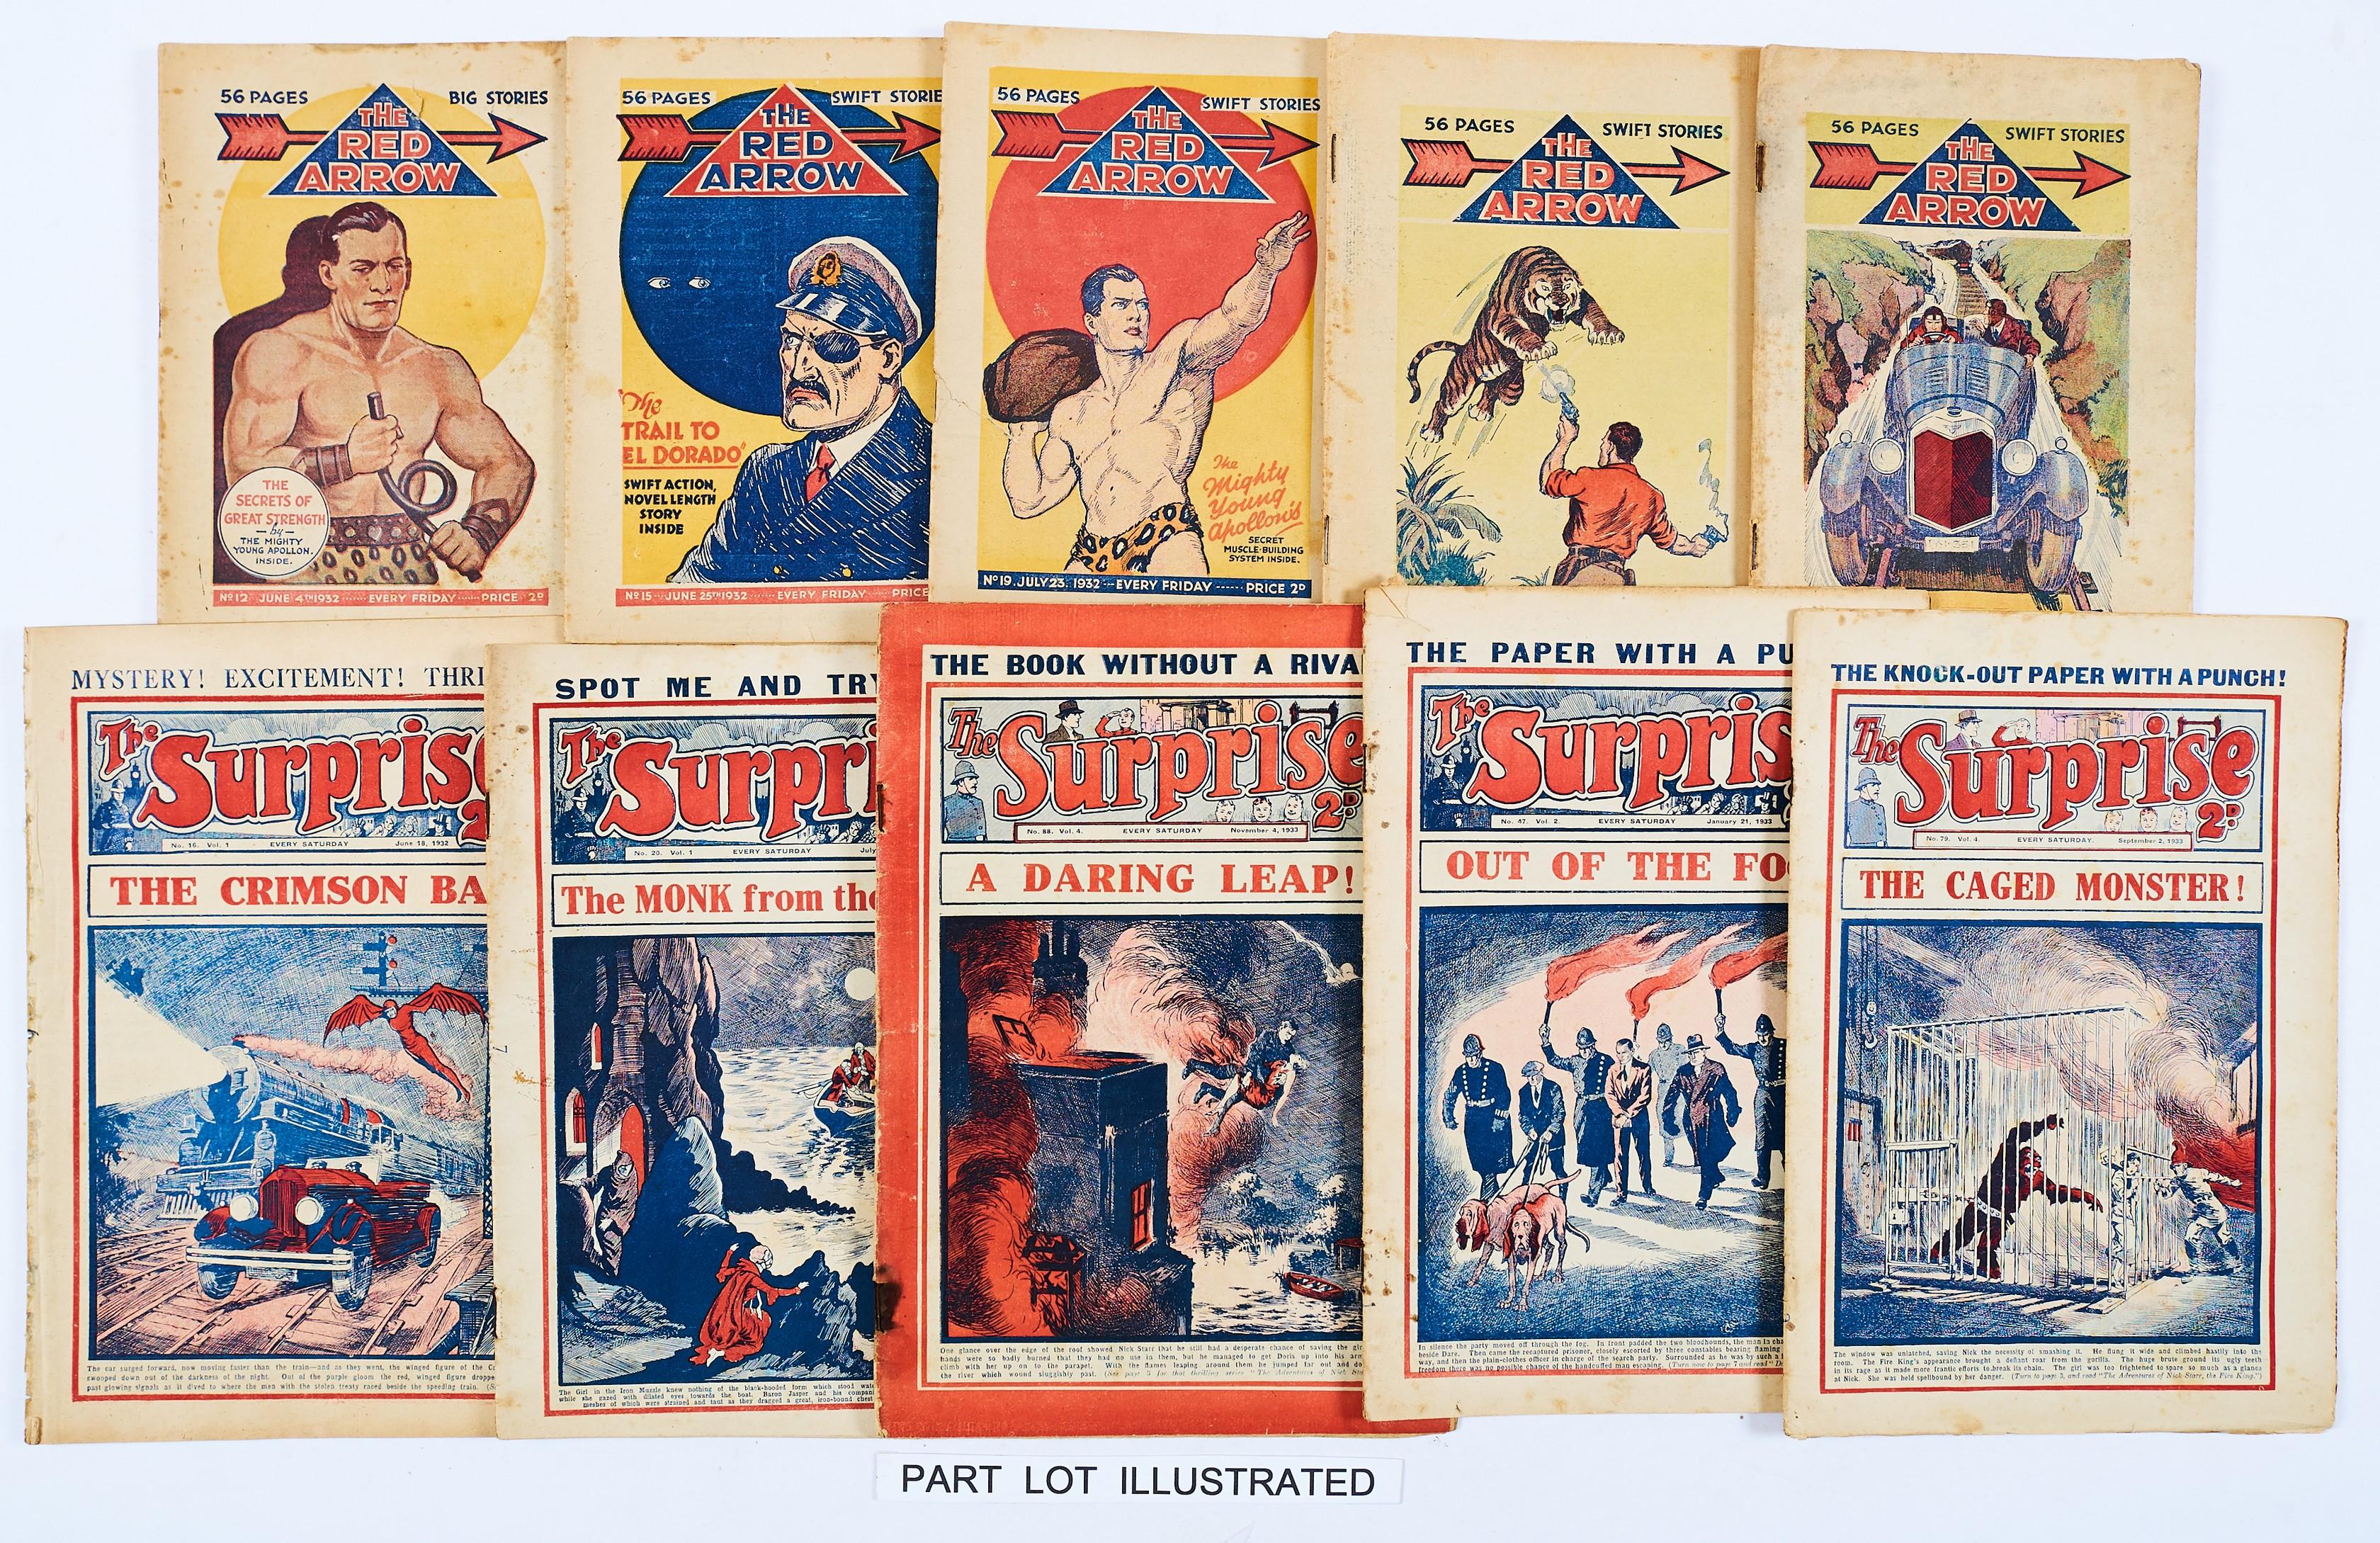 Lot 15 - Red Arrow (1932-33 D C Thomson) 9, 11, 12, 15, 19, 30, 31, 33, 46. With Surprise (1932-33 Am. Press)